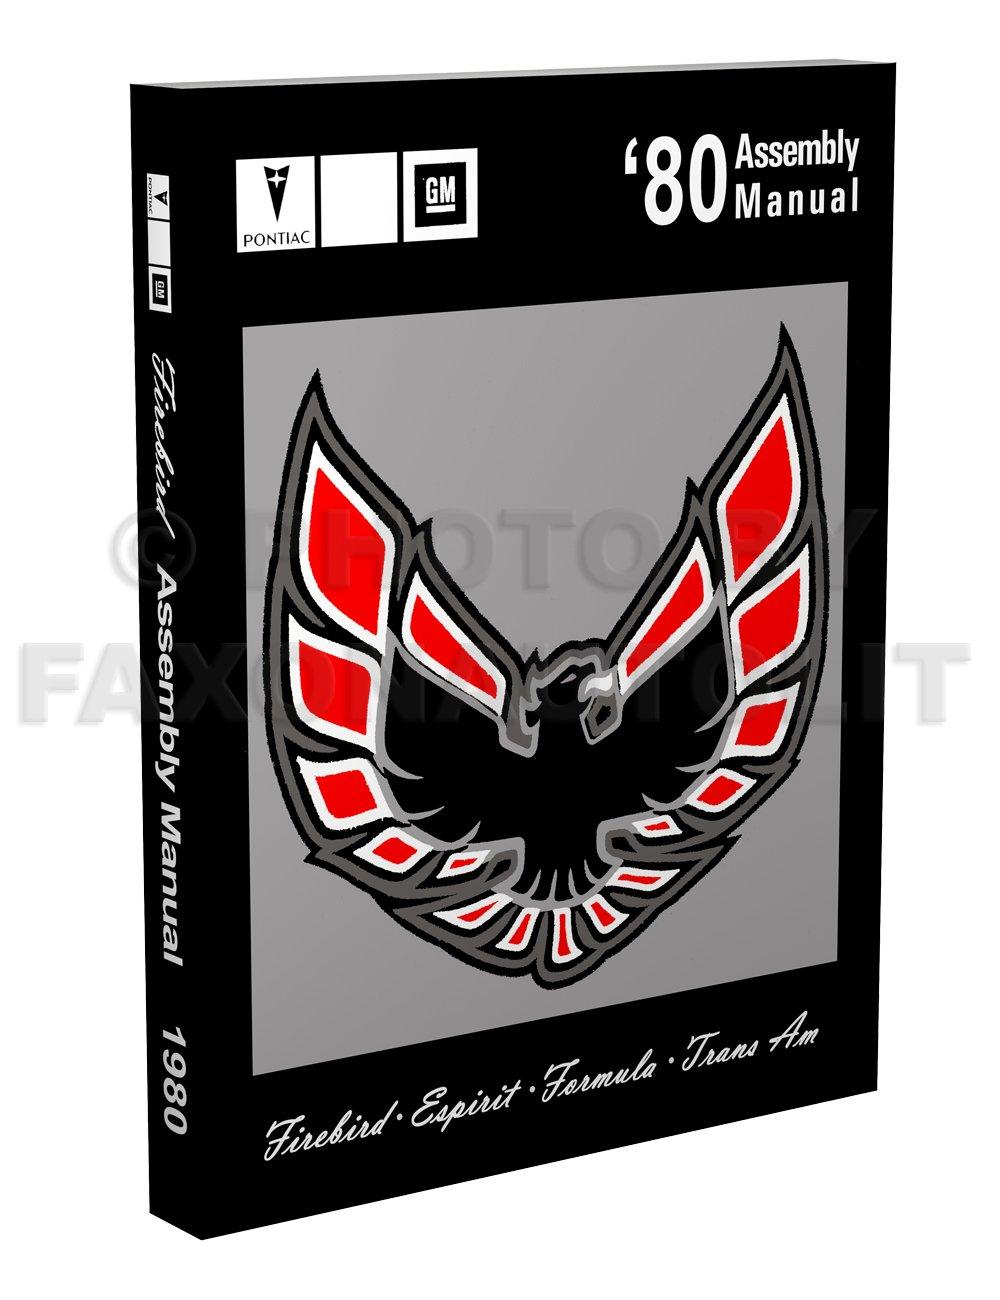 1980 Pontiac Firebird Assembly Manual Turbo Trans Am Esprit Formula: Faxon  Auto Literature: Amazon.com: Books